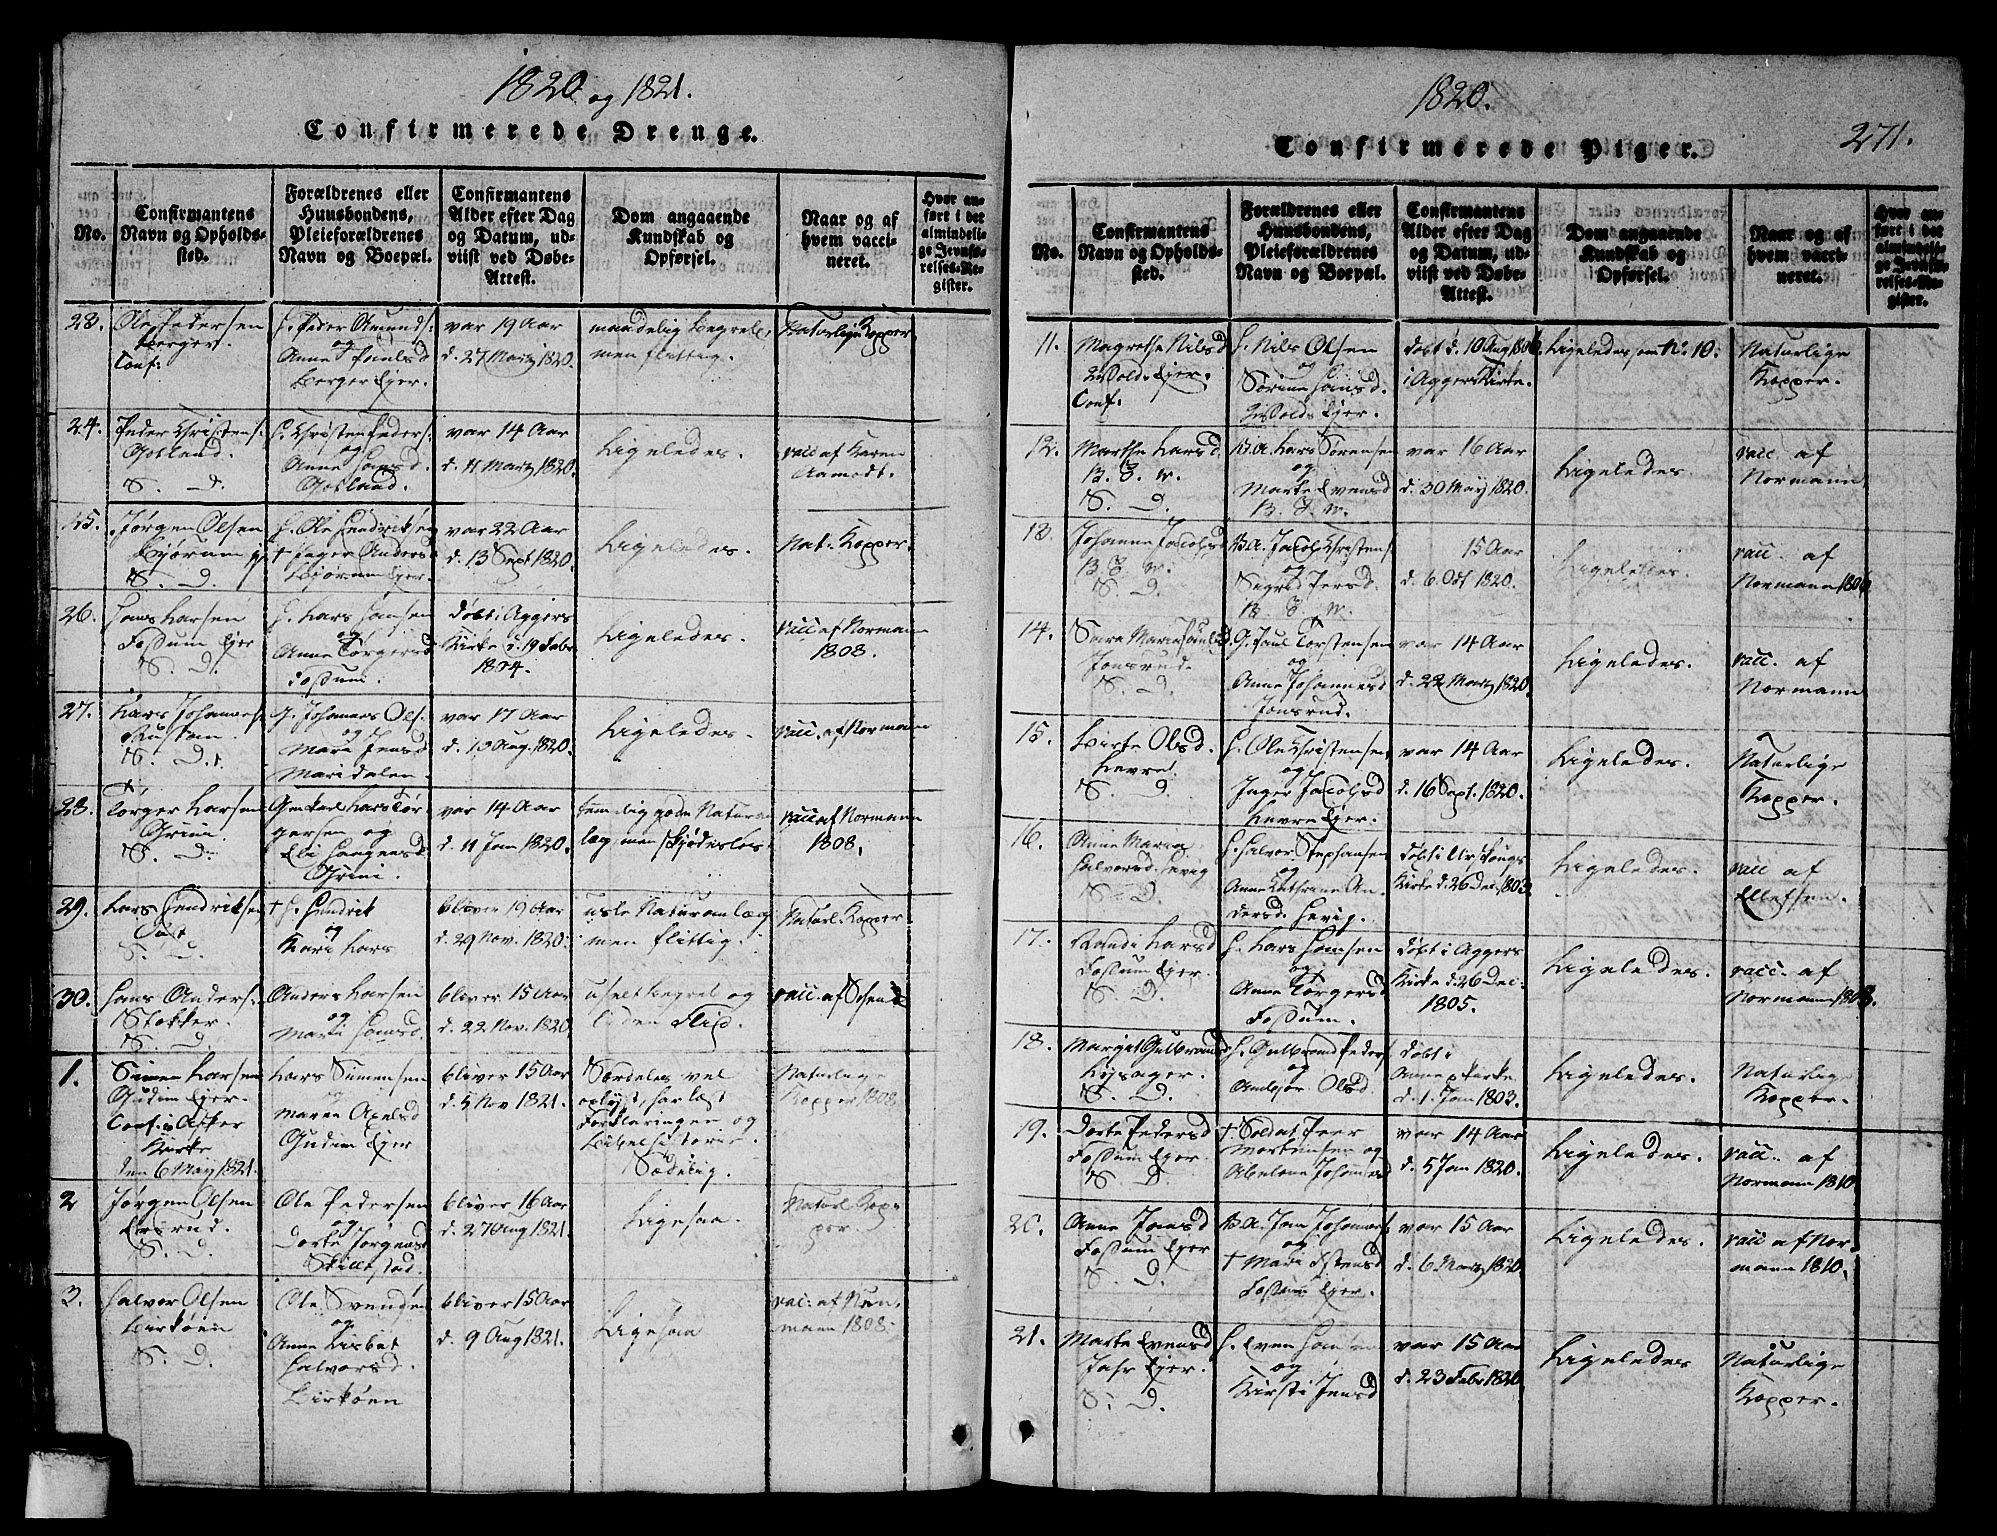 SAO, Asker prestekontor Kirkebøker, G/Ga/L0001: Klokkerbok nr. I 1, 1814-1830, s. 271